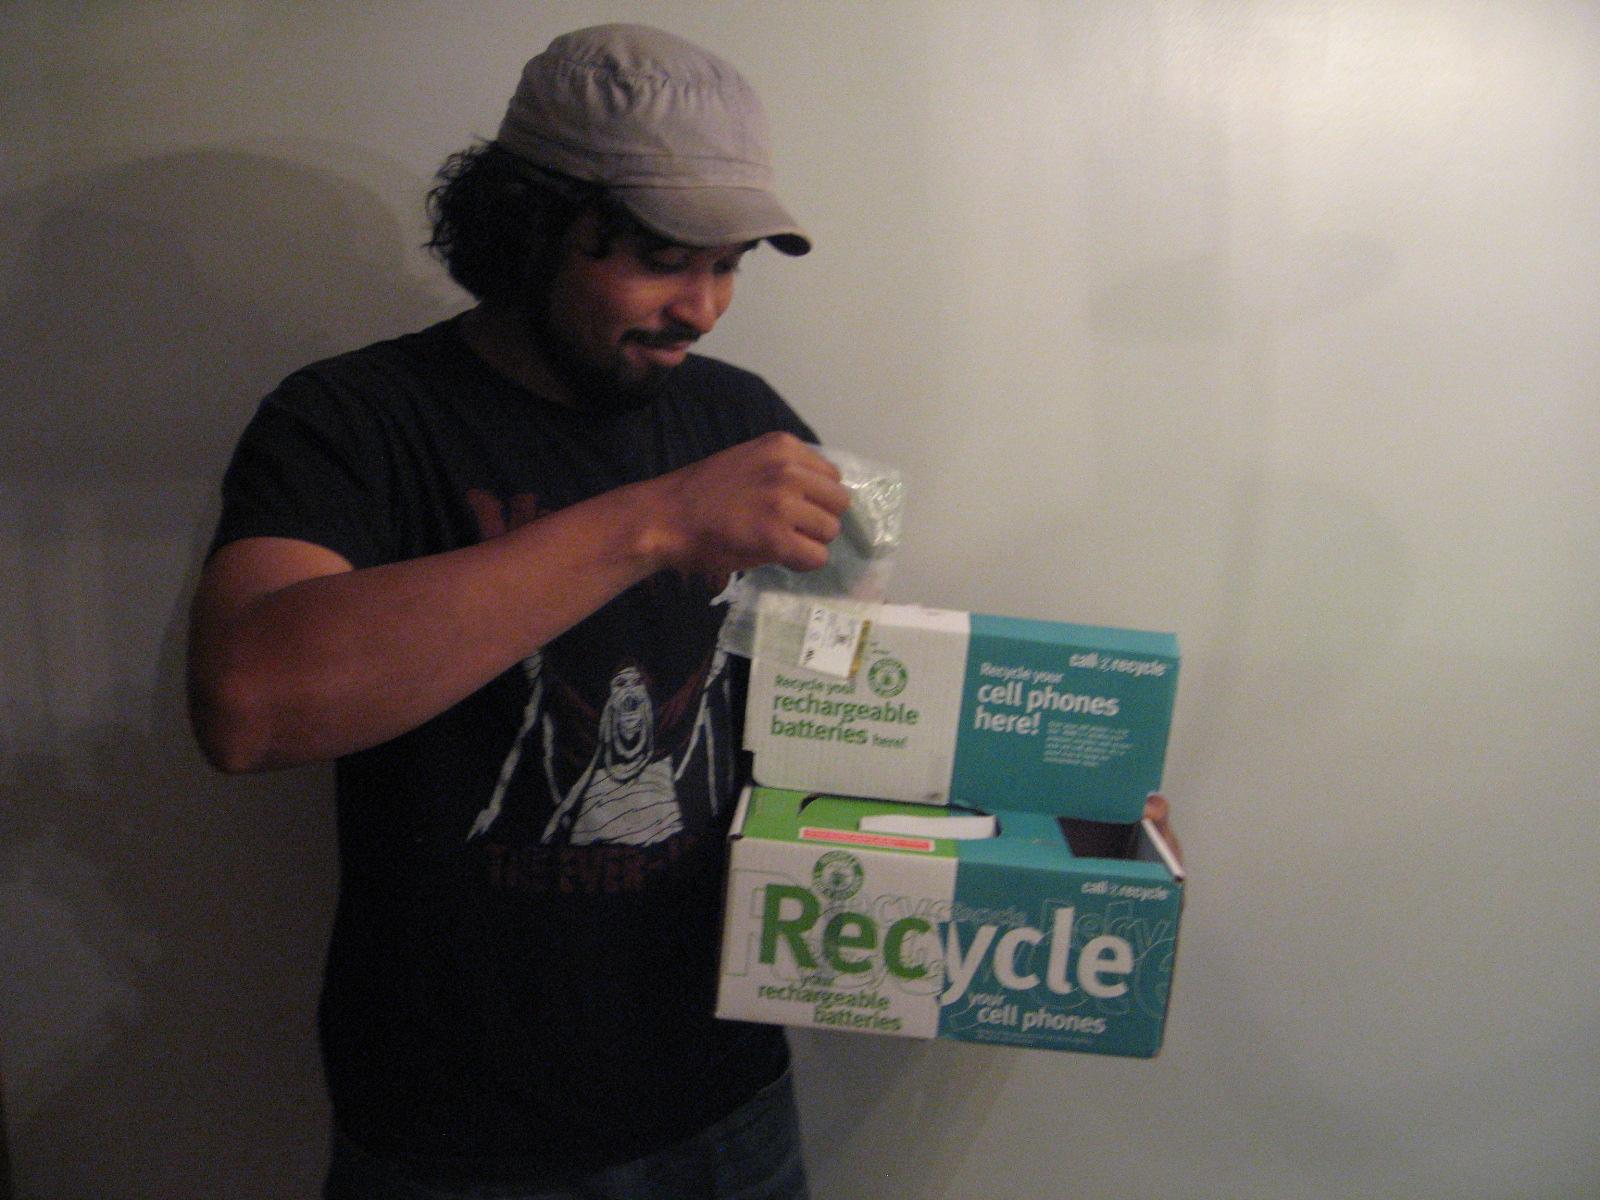 iPod Battery Recycling Program